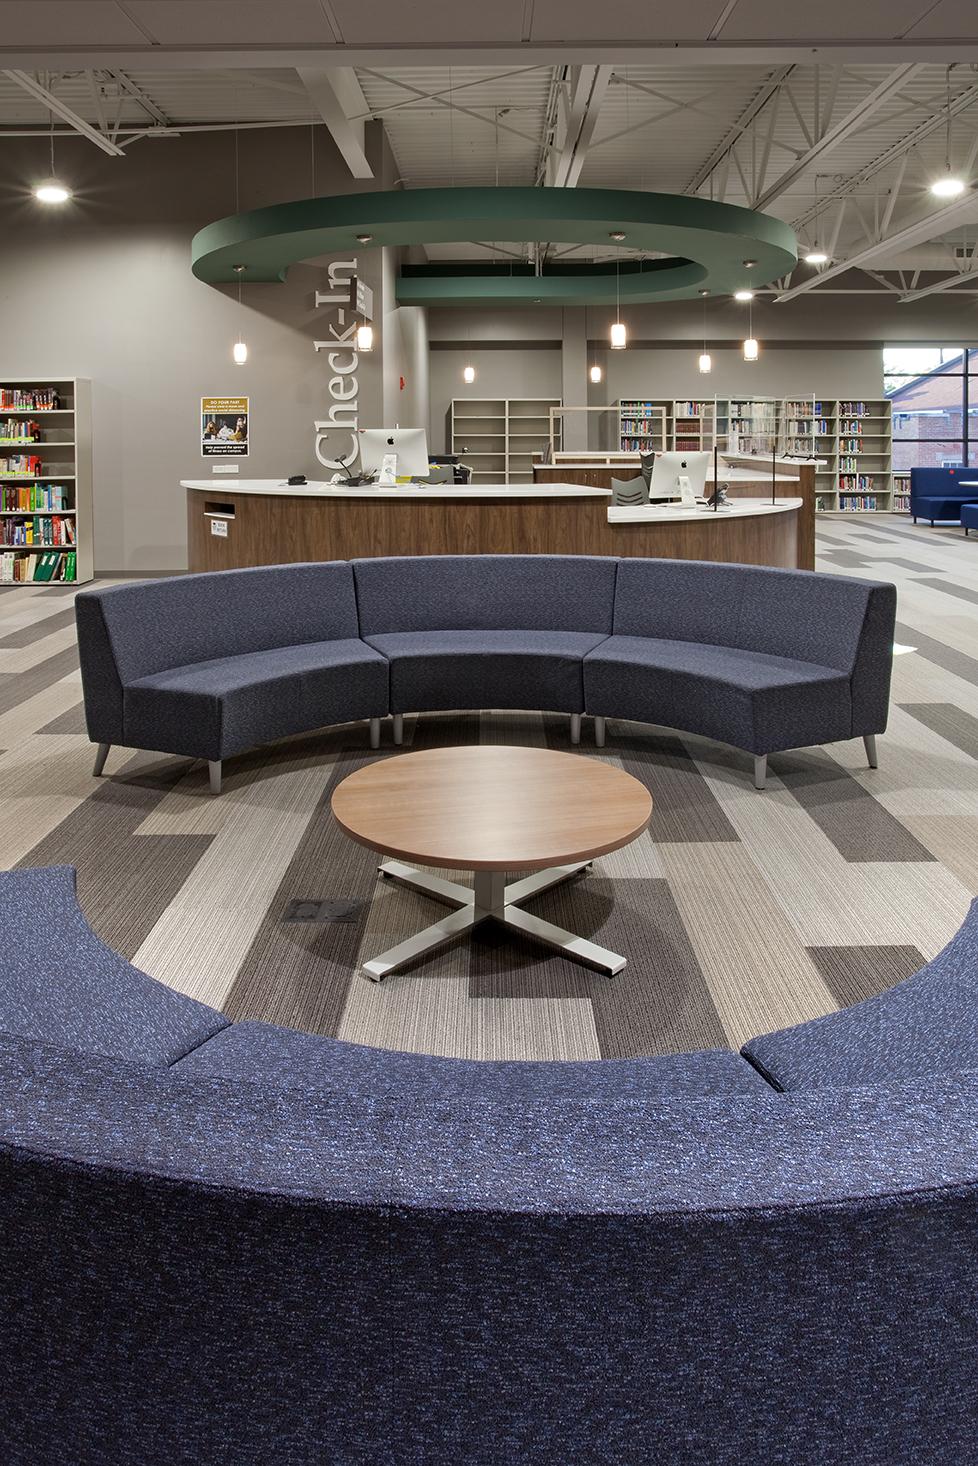 benet-academy-library-2-lo